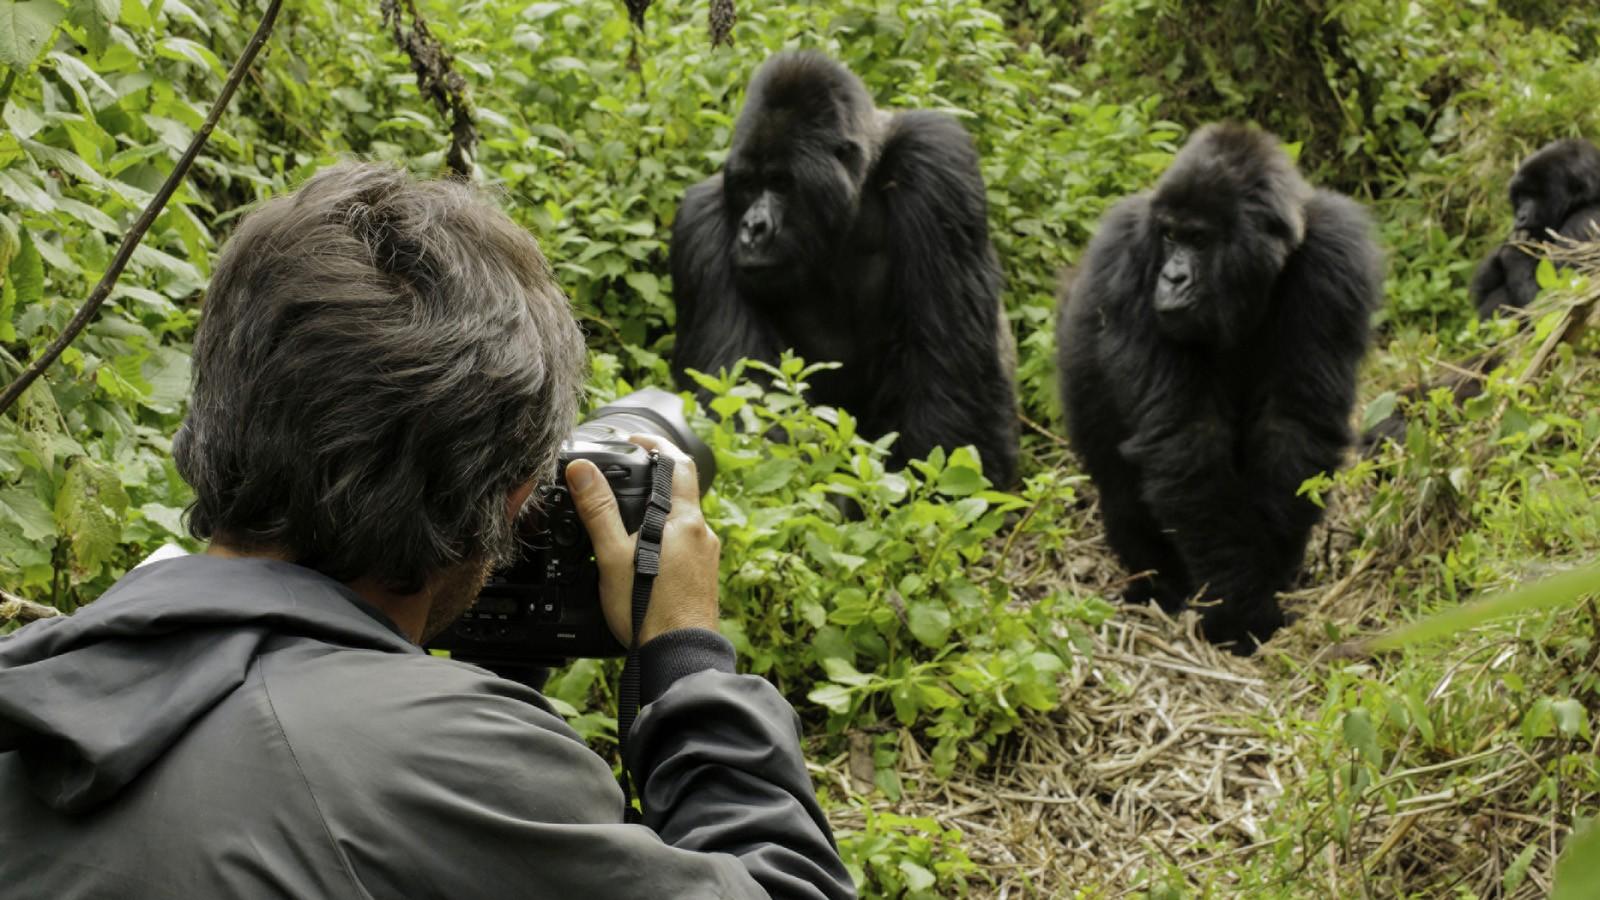 Photographer taking photos of Silverback Mountain Gorilla (Gorilla gorilla beringei), Parc National des Volcans, Rwanda, Africa